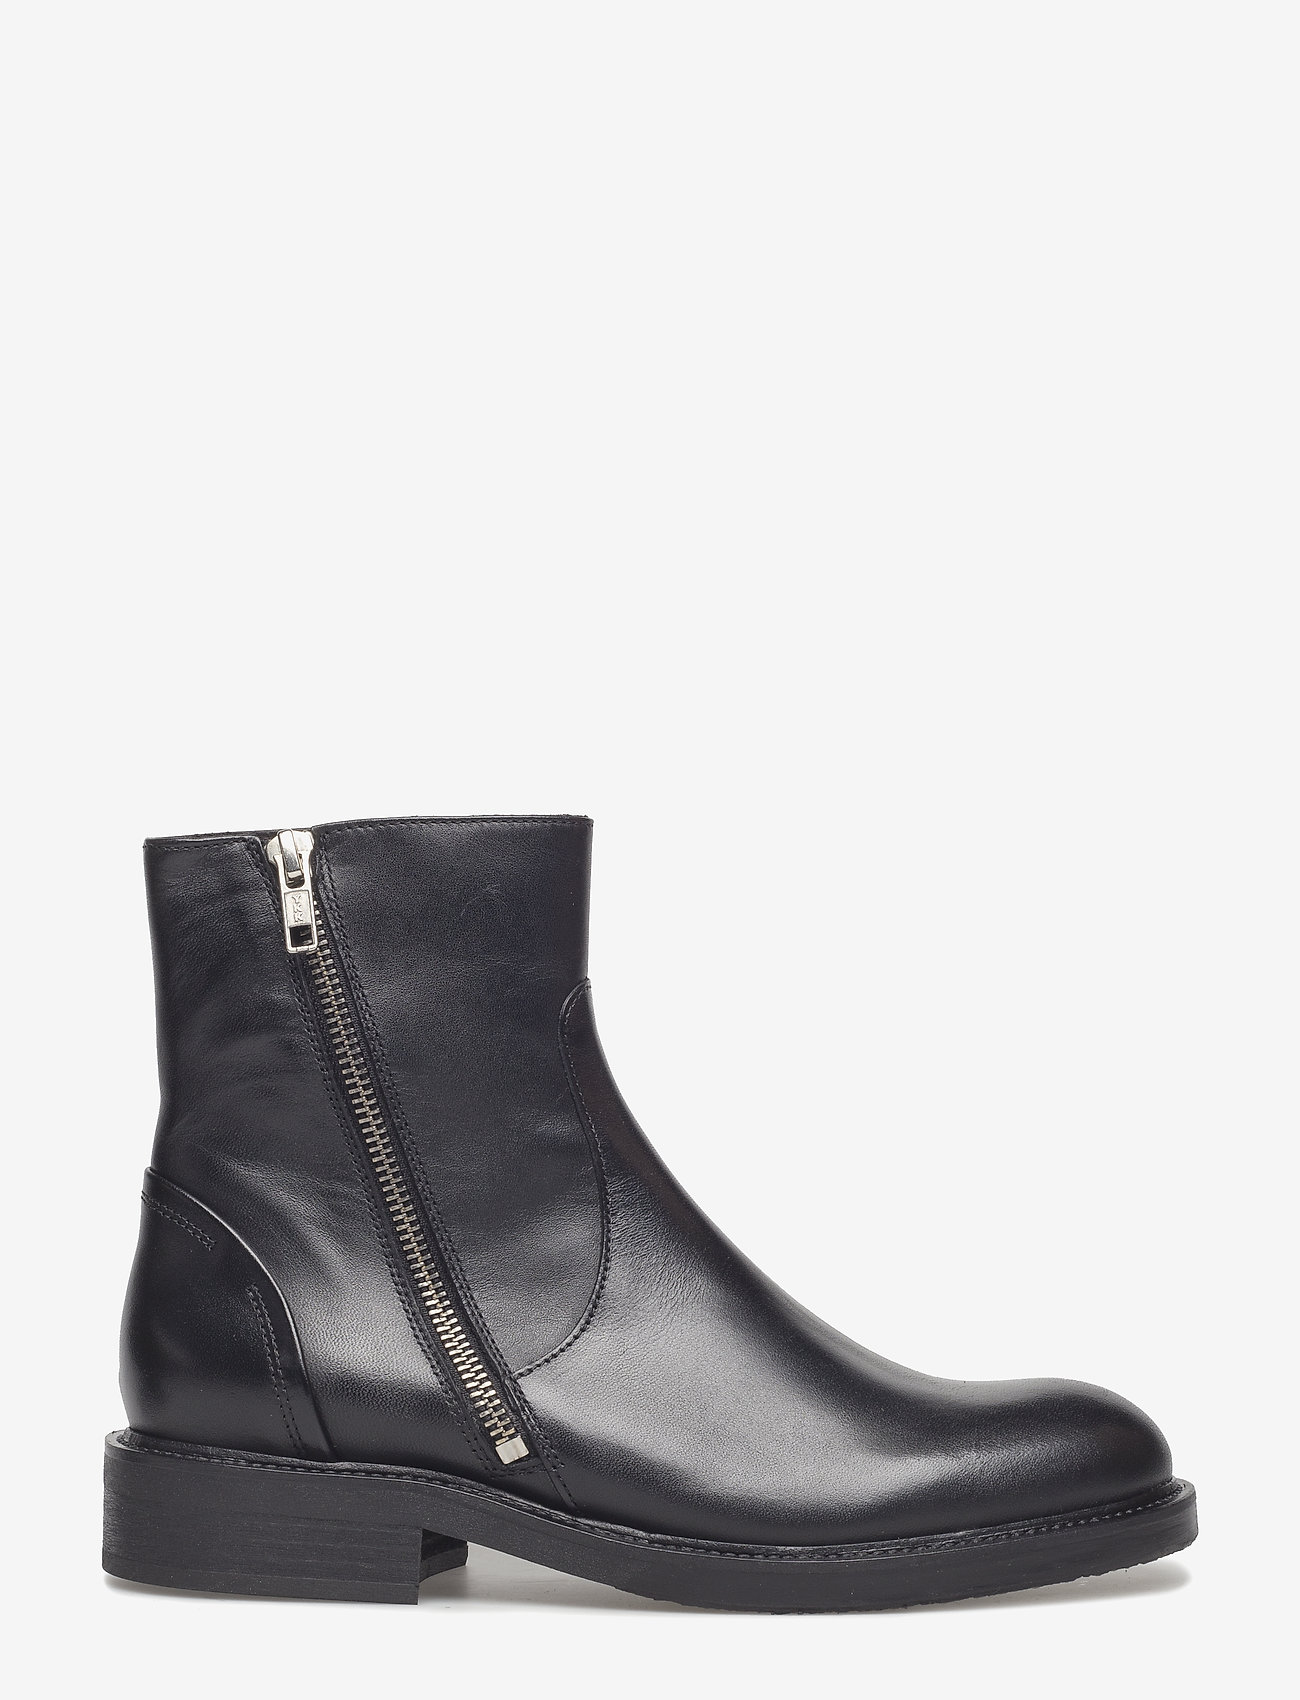 Billi Bi - Boots 813102 - platte enkellaarsjes - black calf 80 - 1